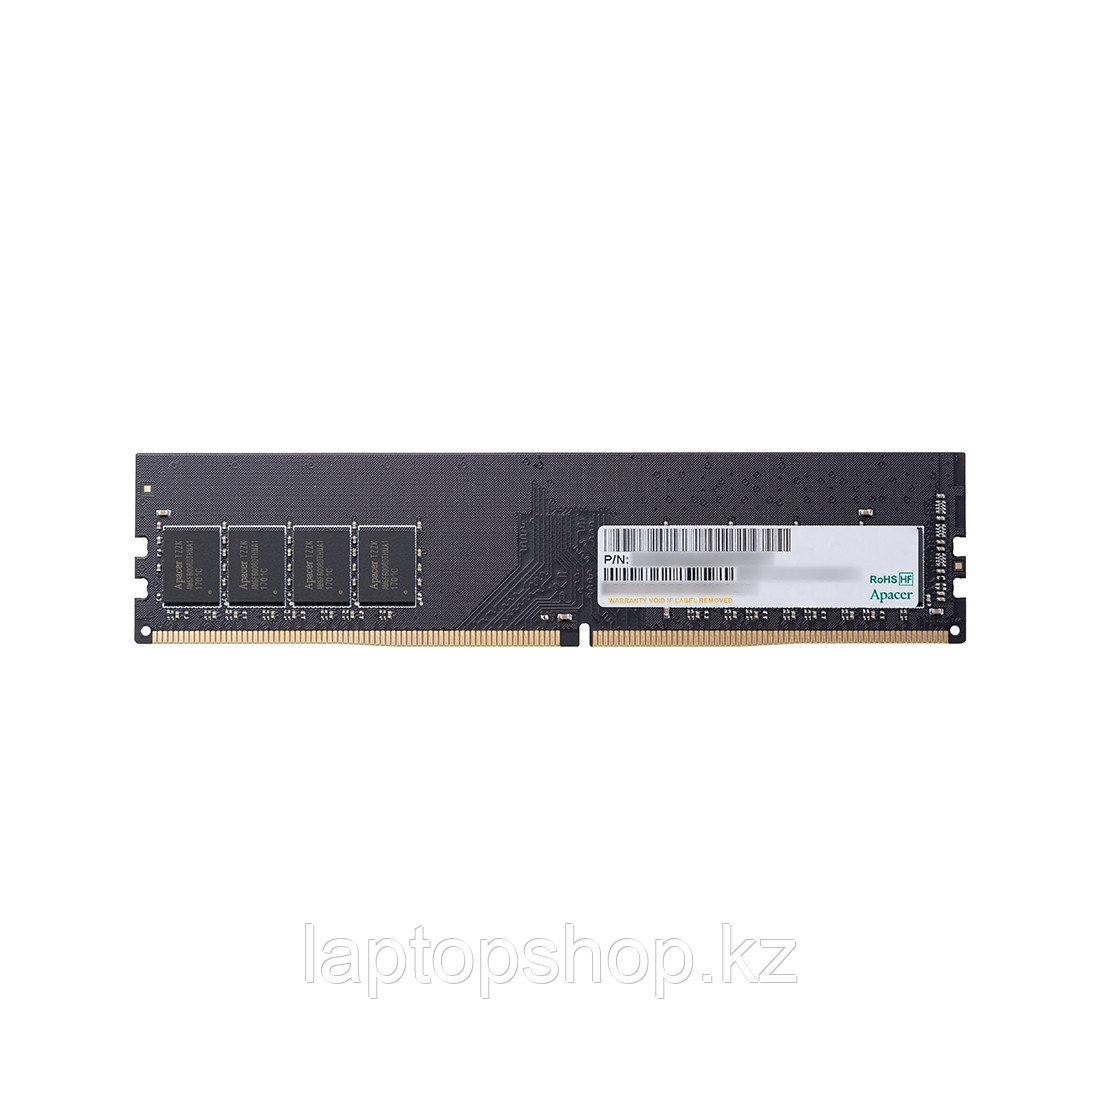 Память DIMM DDR4 8Gb Apacer, EL.08G2V.GNH, DIMM